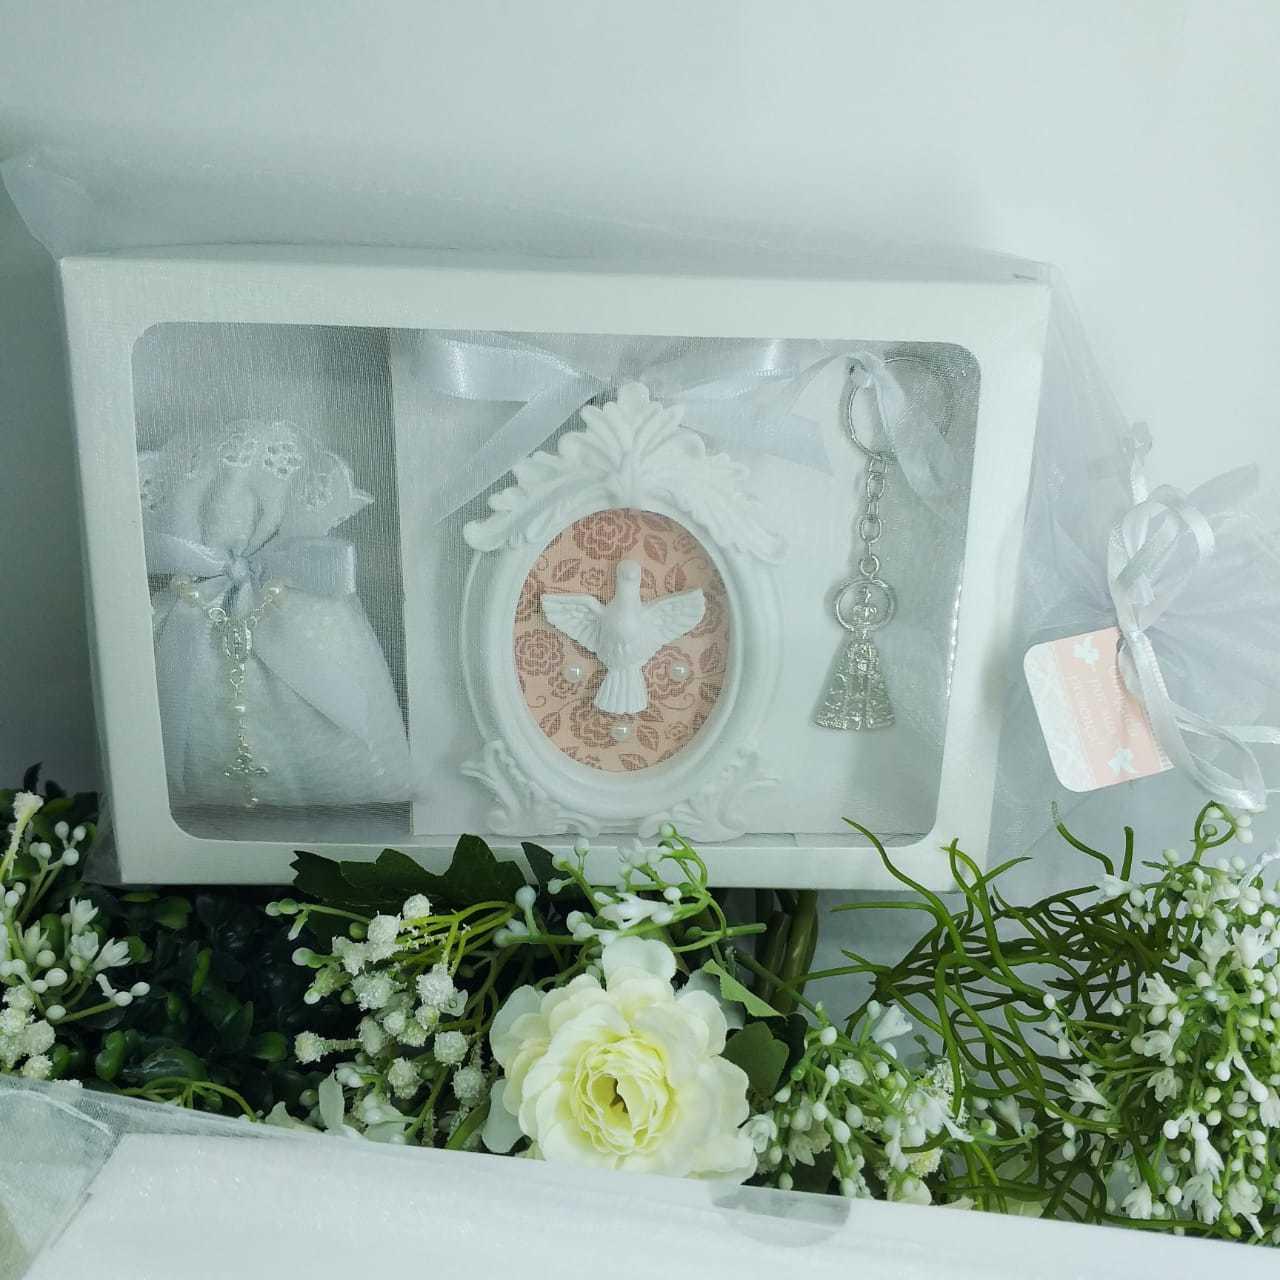 Conjunto Quadro, Chaveiro e Sachê Perfumado na Caixa Batismo